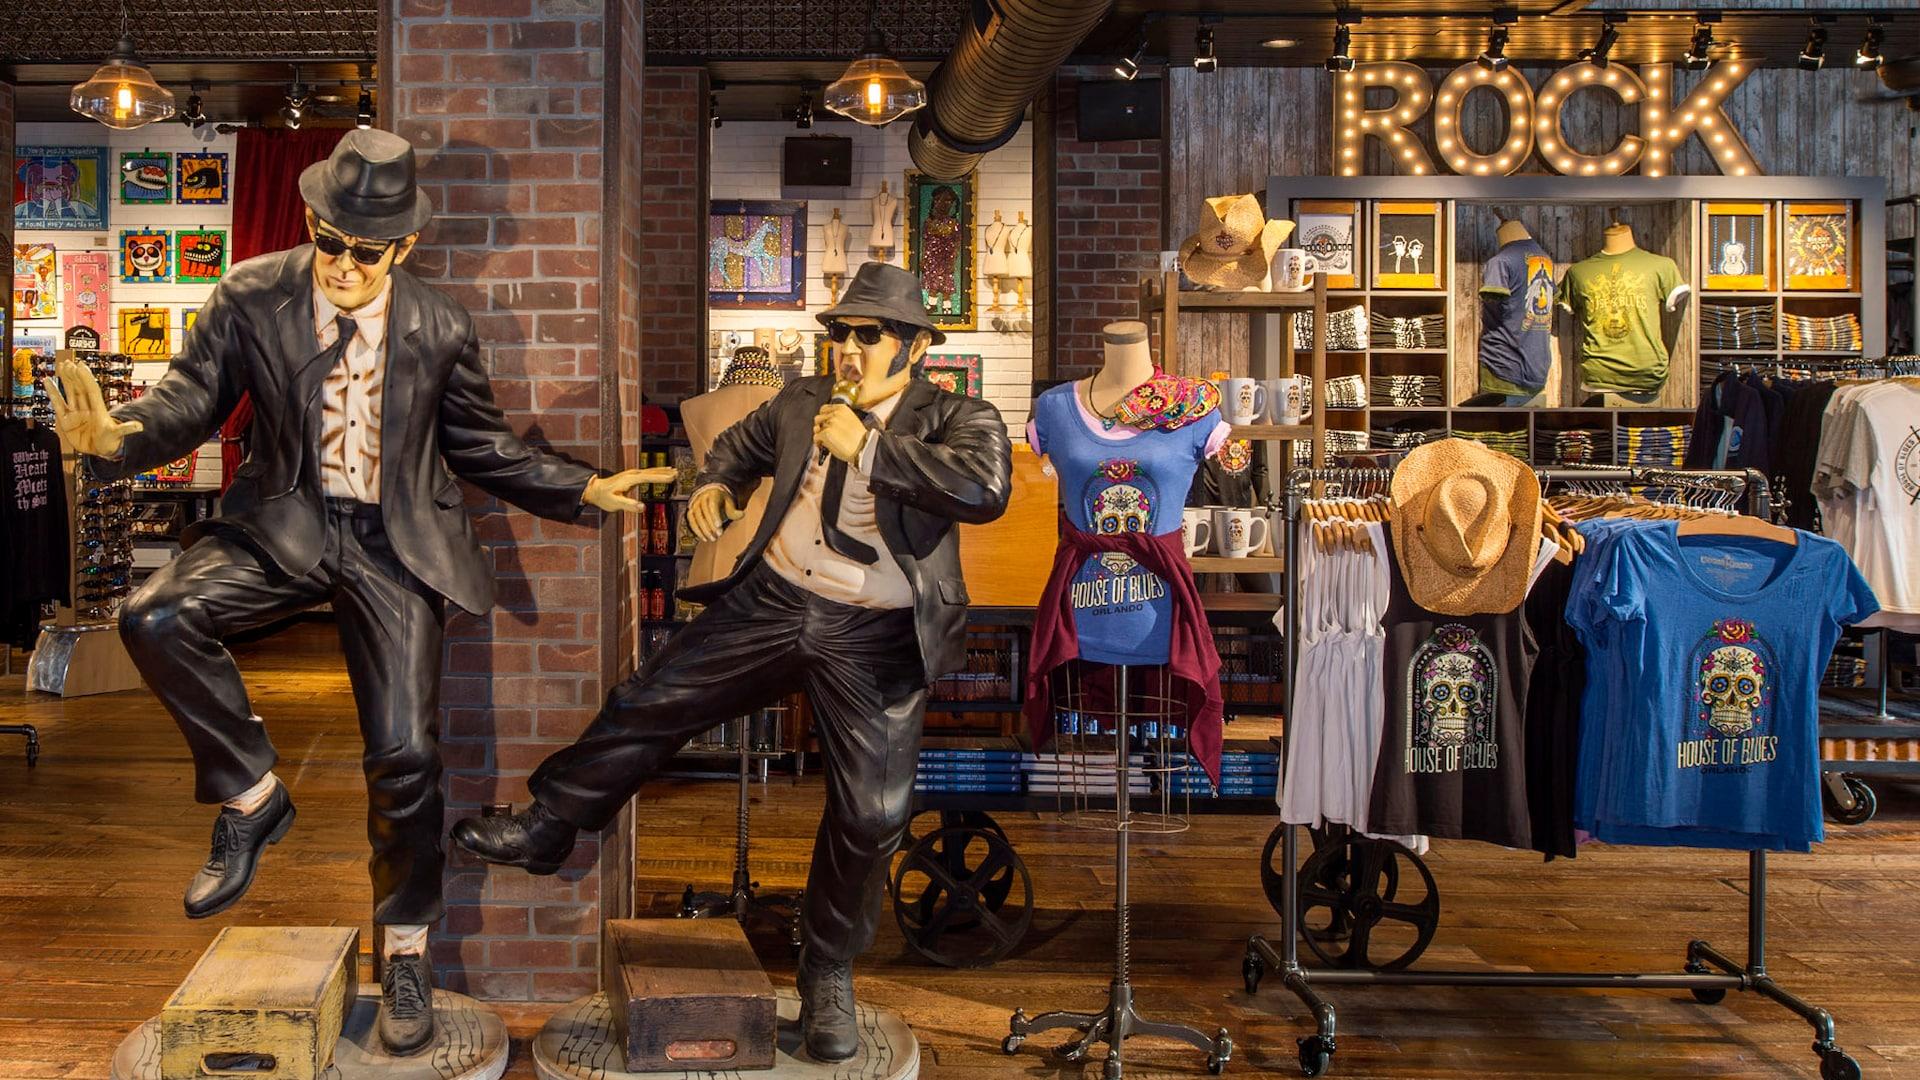 Gear Shop, House of Blues